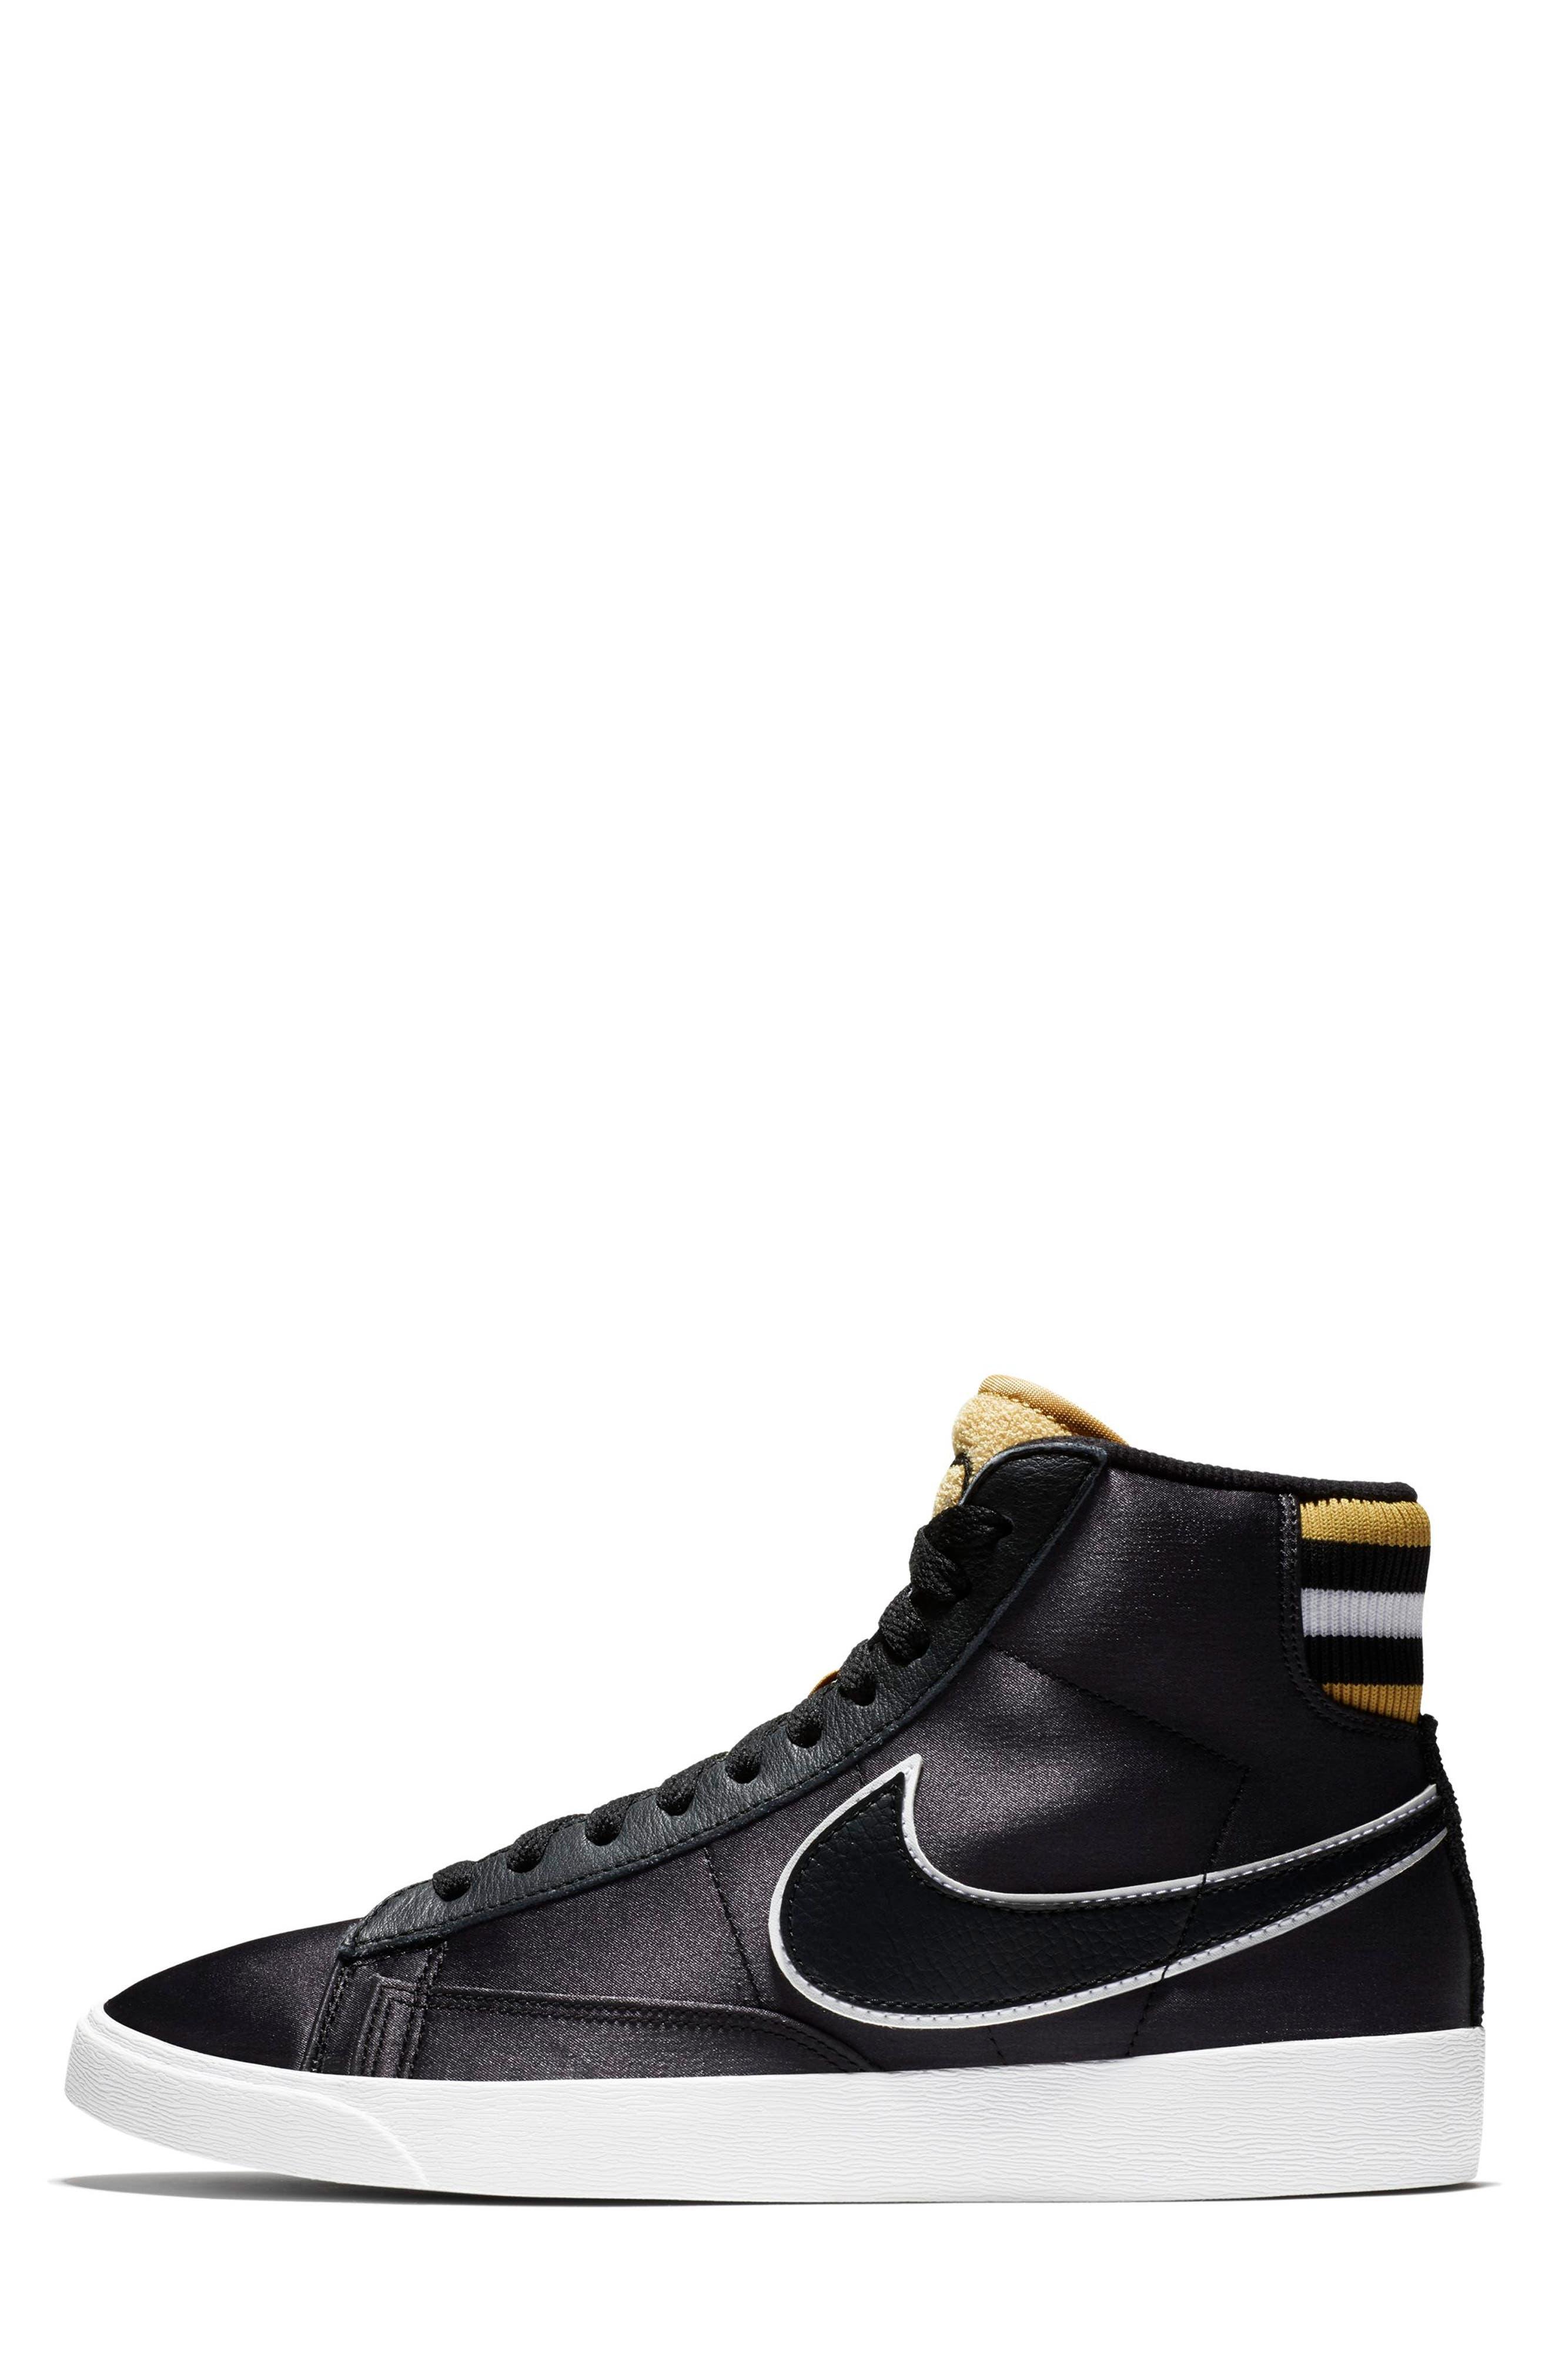 Blazer Mid Top Sneaker,                             Alternate thumbnail 3, color,                             BLACK/ BLACK